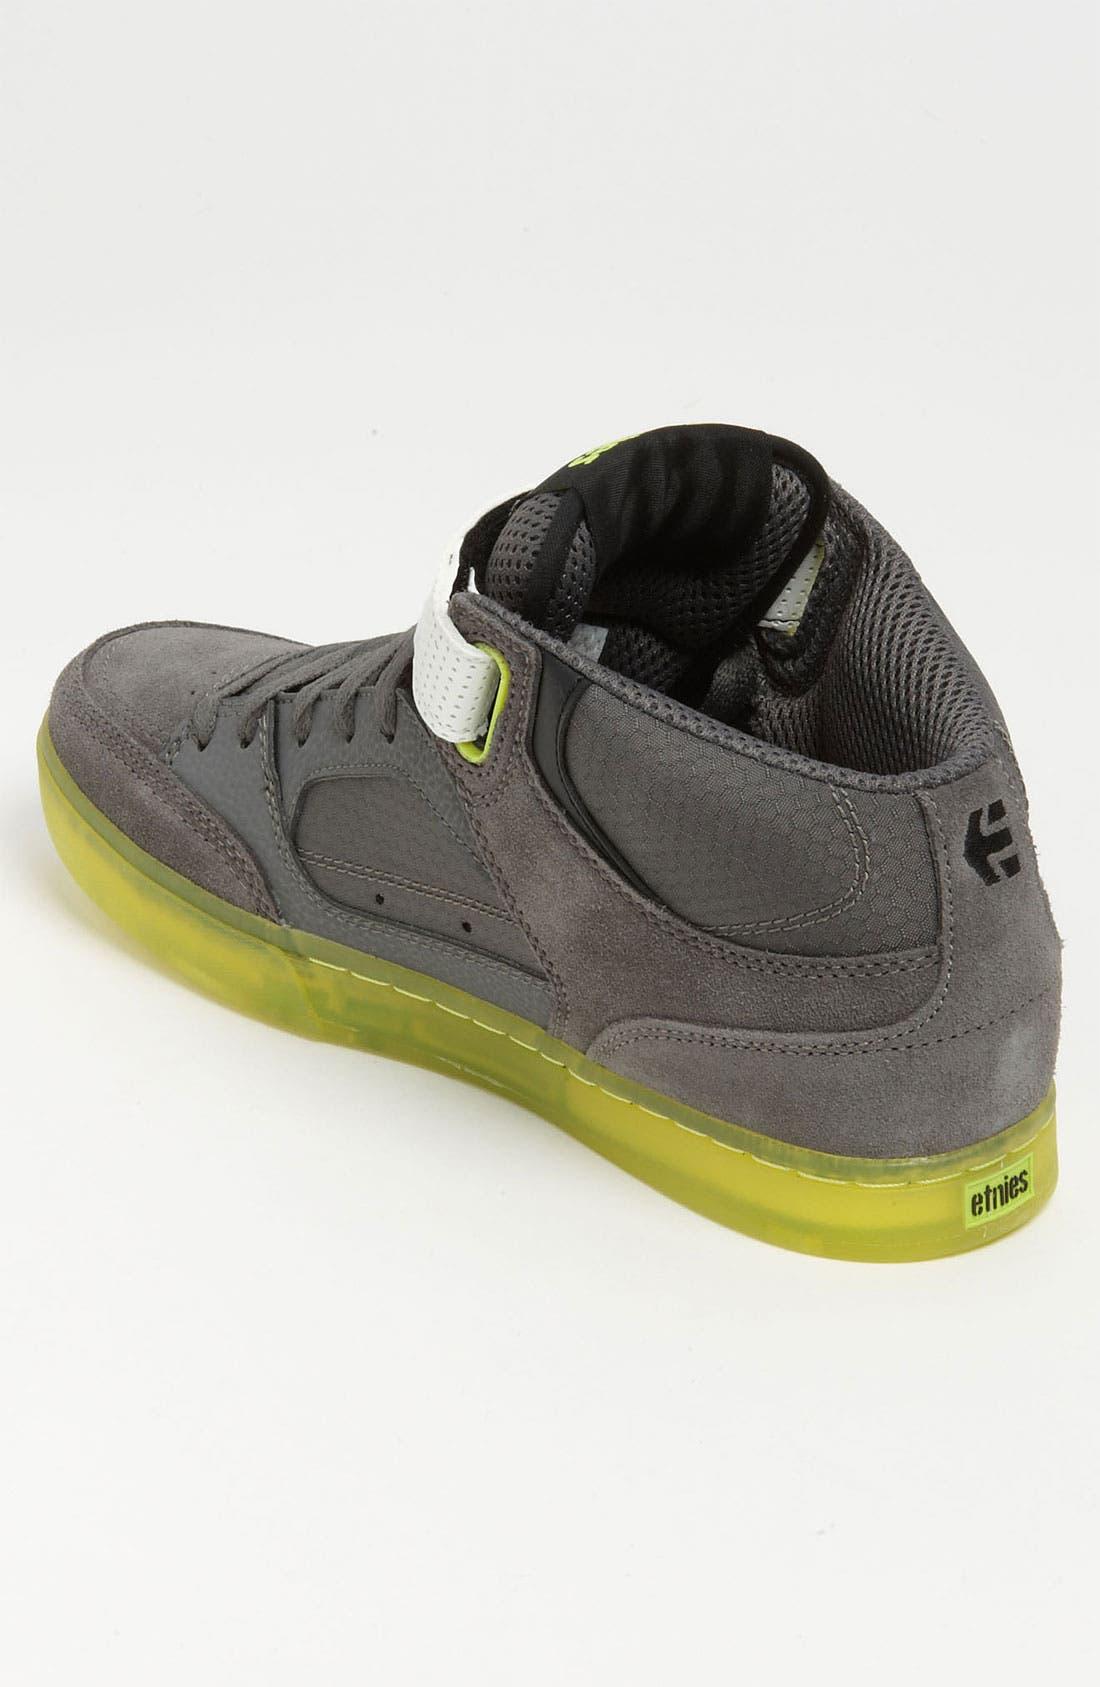 Alternate Image 2  - Etnies 'Number Mid' Skate Shoe (Men)